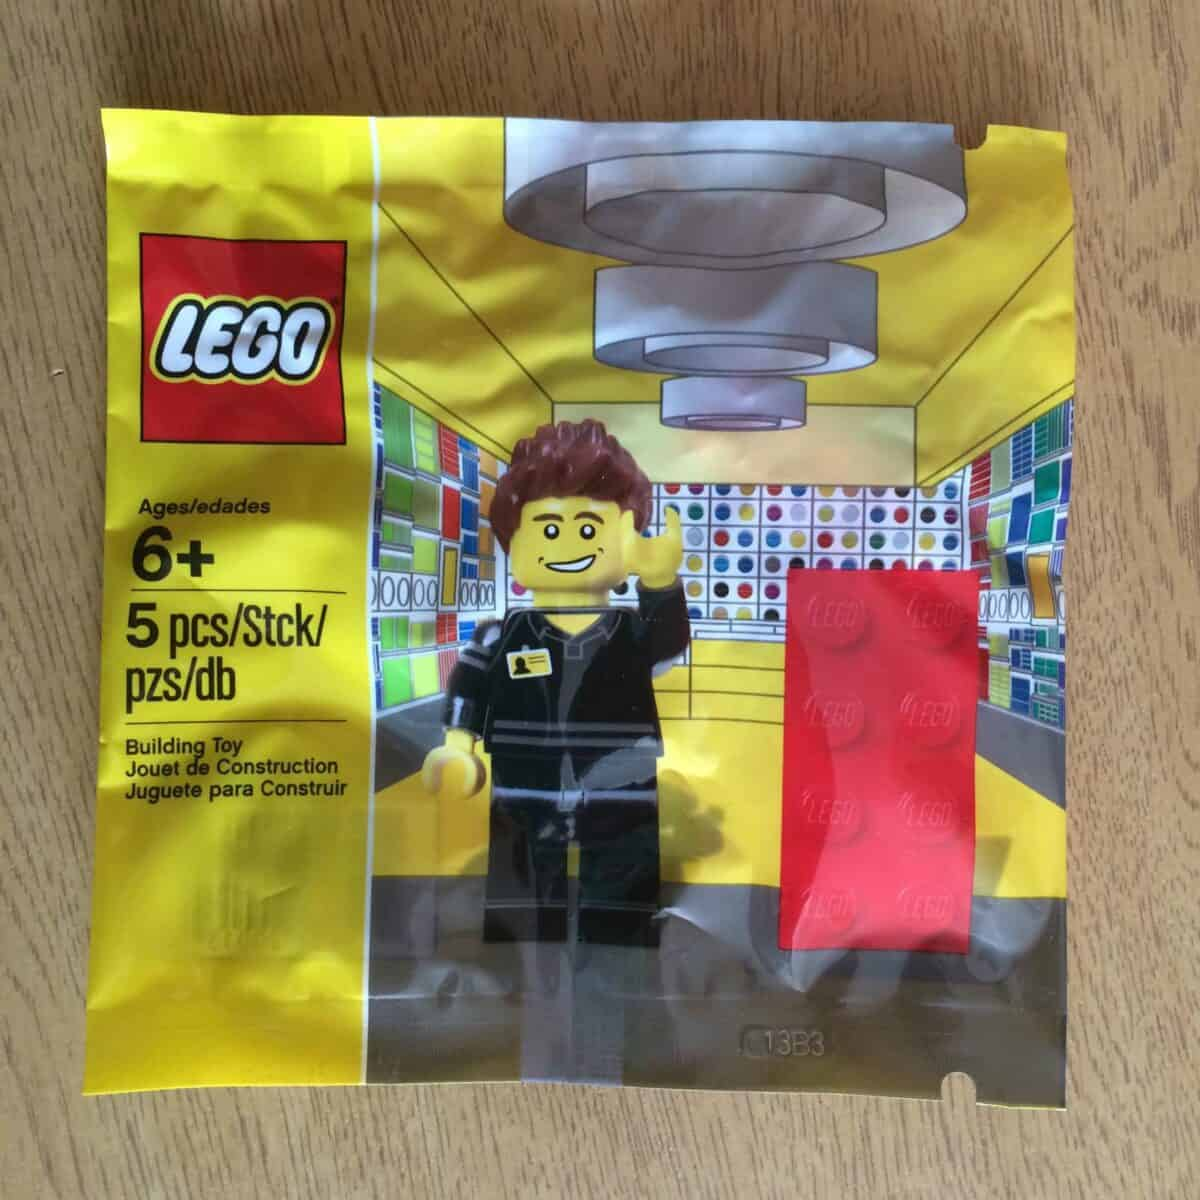 LEGO Set 5001622-1 Lego Store Employee Polybag